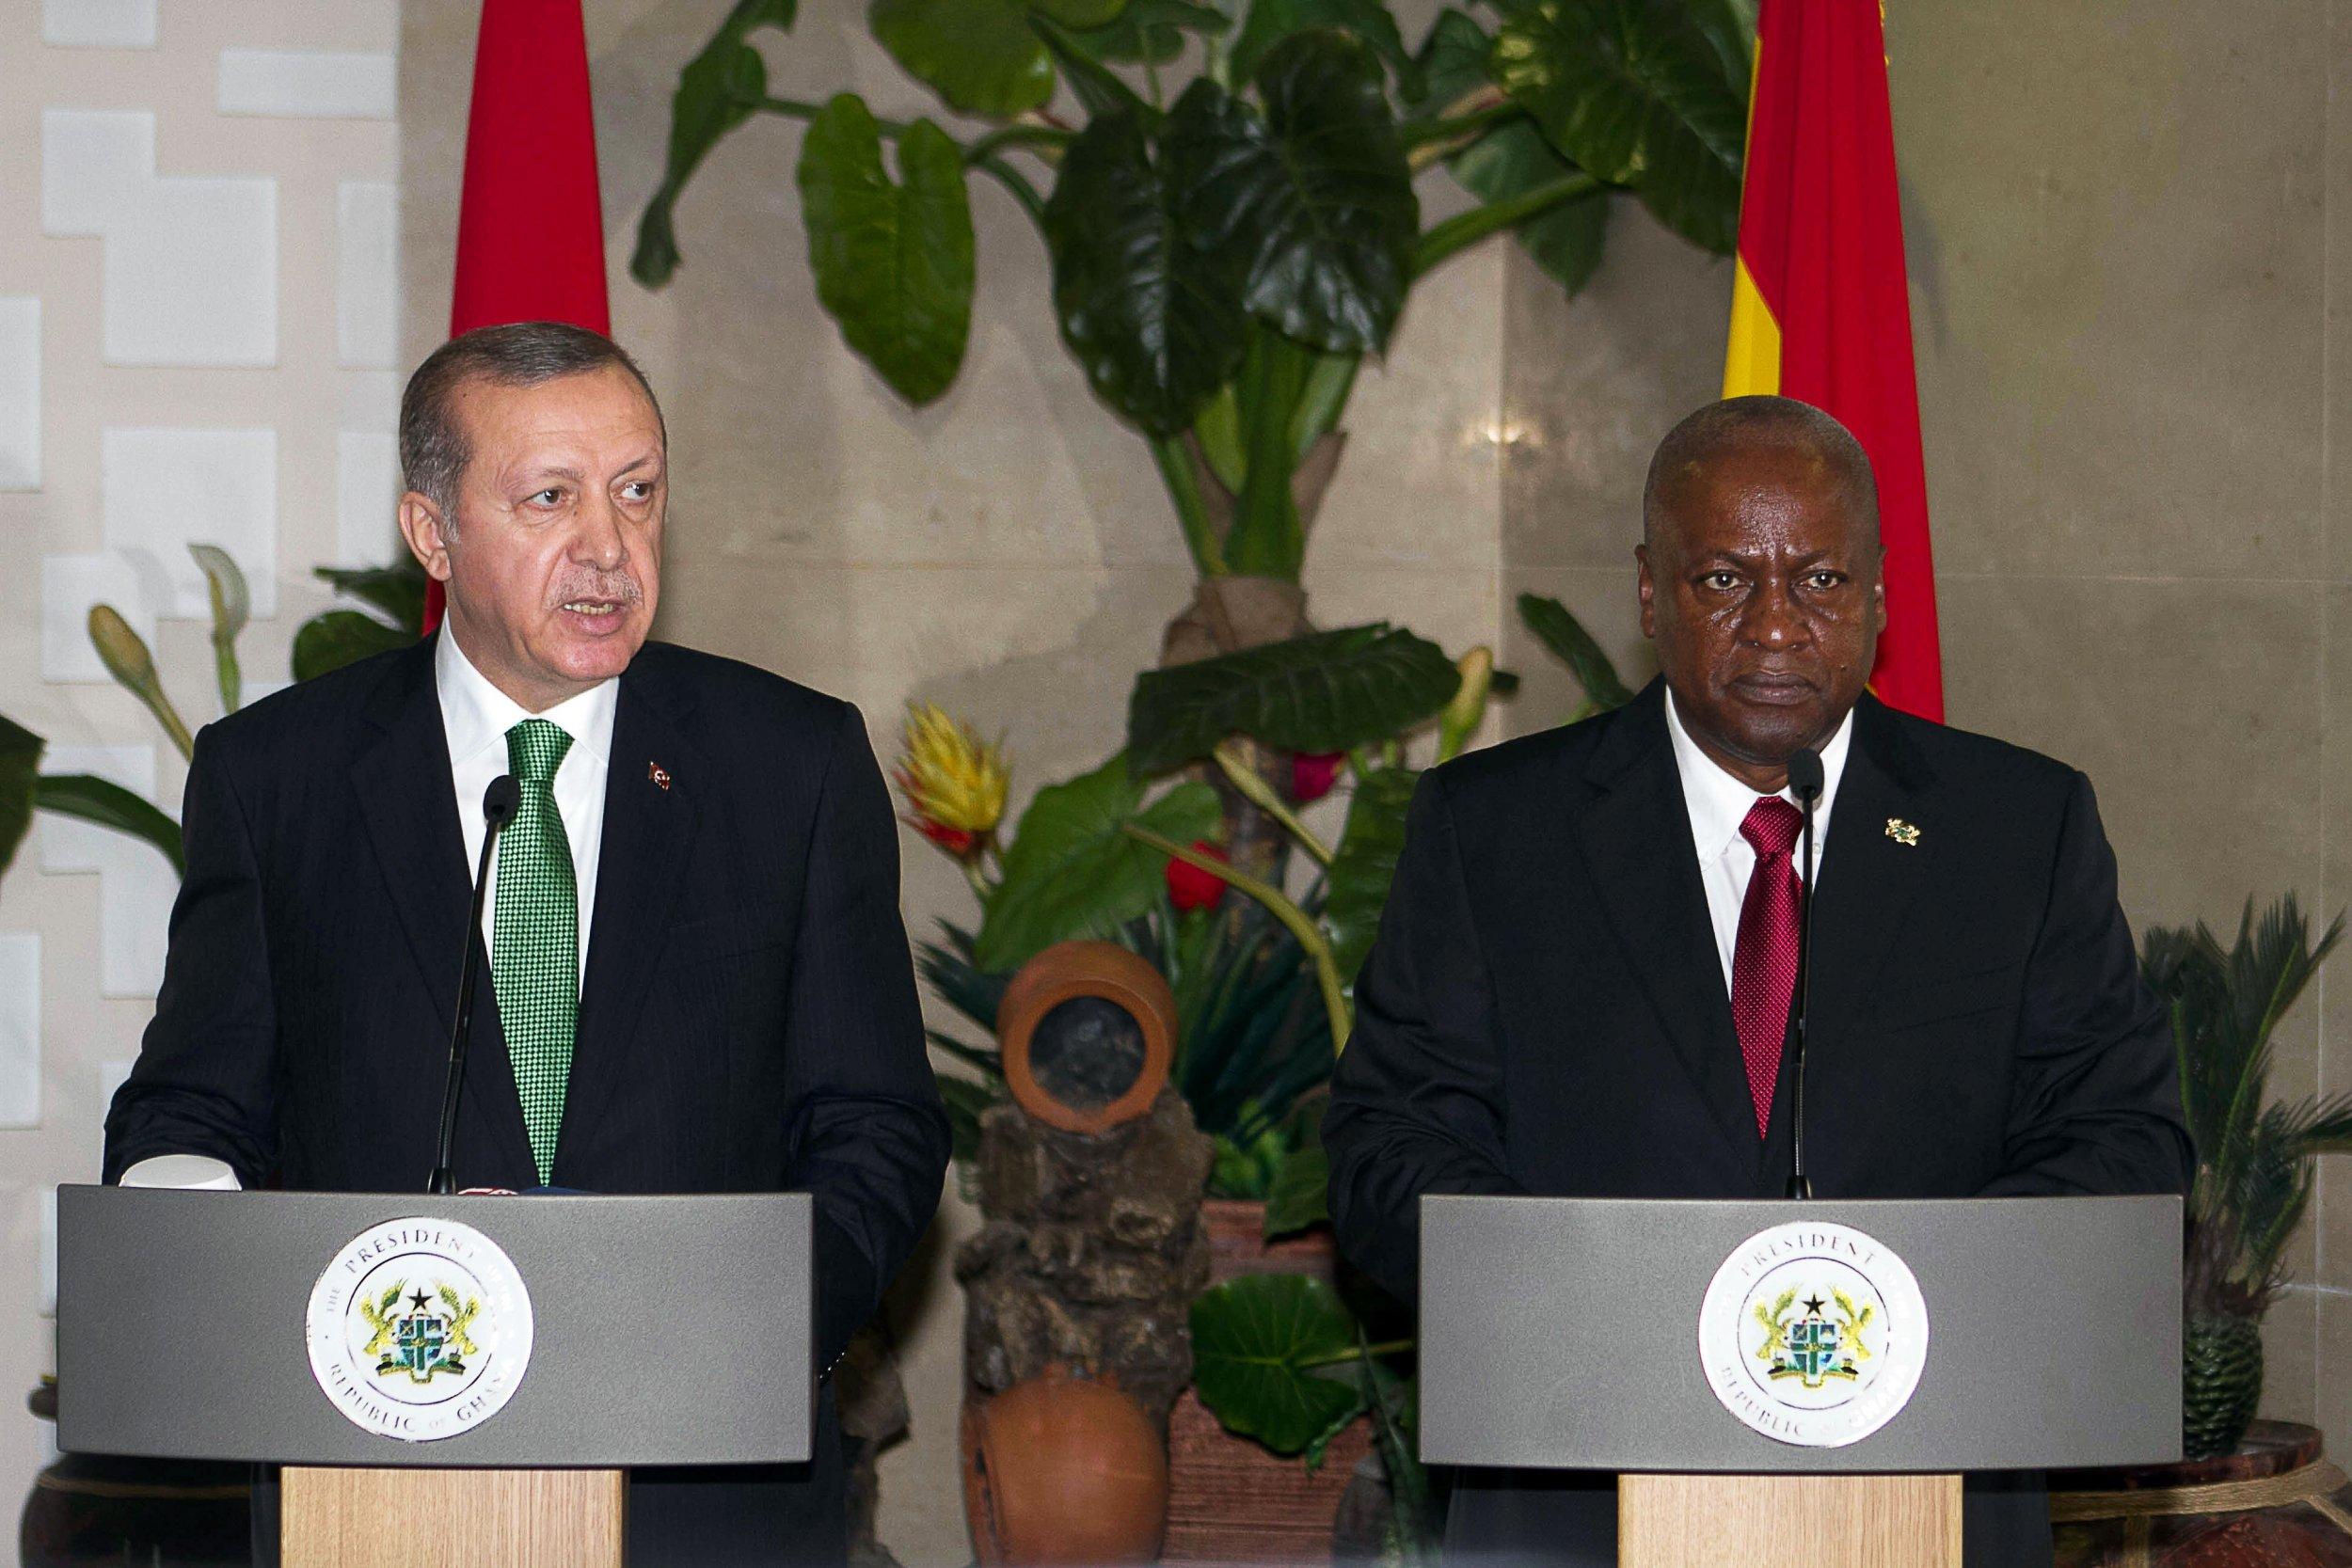 Turkish president Recep Tayyip Erdogan with Ghanaian president John Mahama.